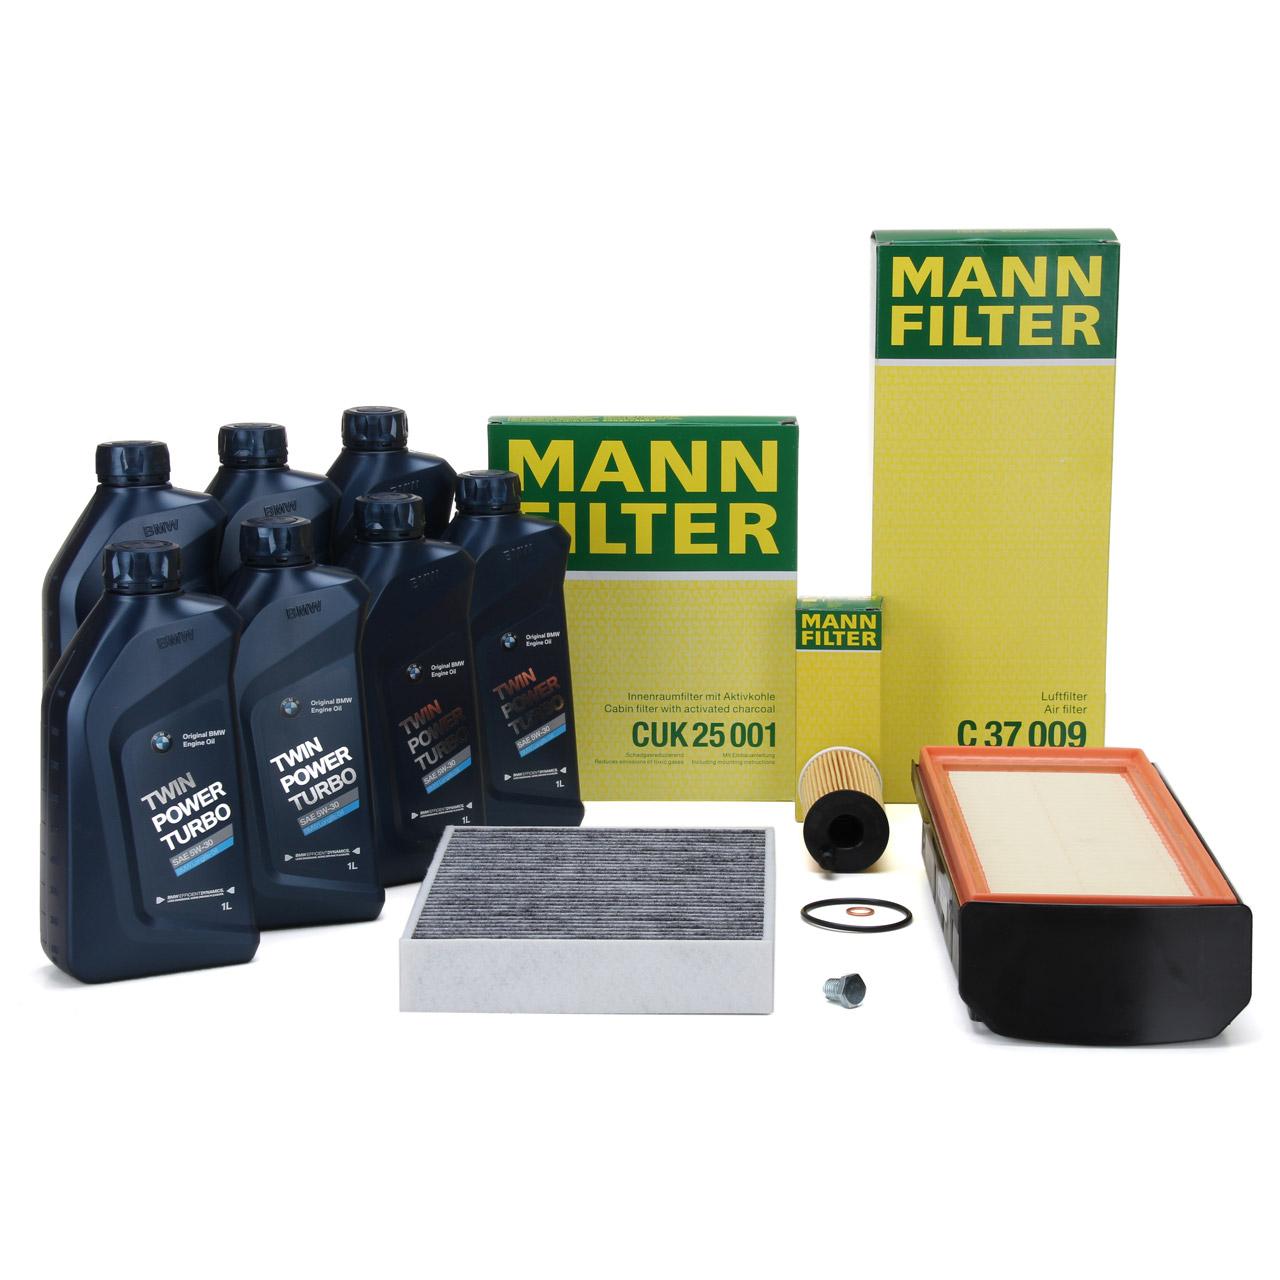 MANN Filterset + 7 L ORIGINAL BMW 5W30 Motoröl für 3er F30 F31 F34 330d 335d